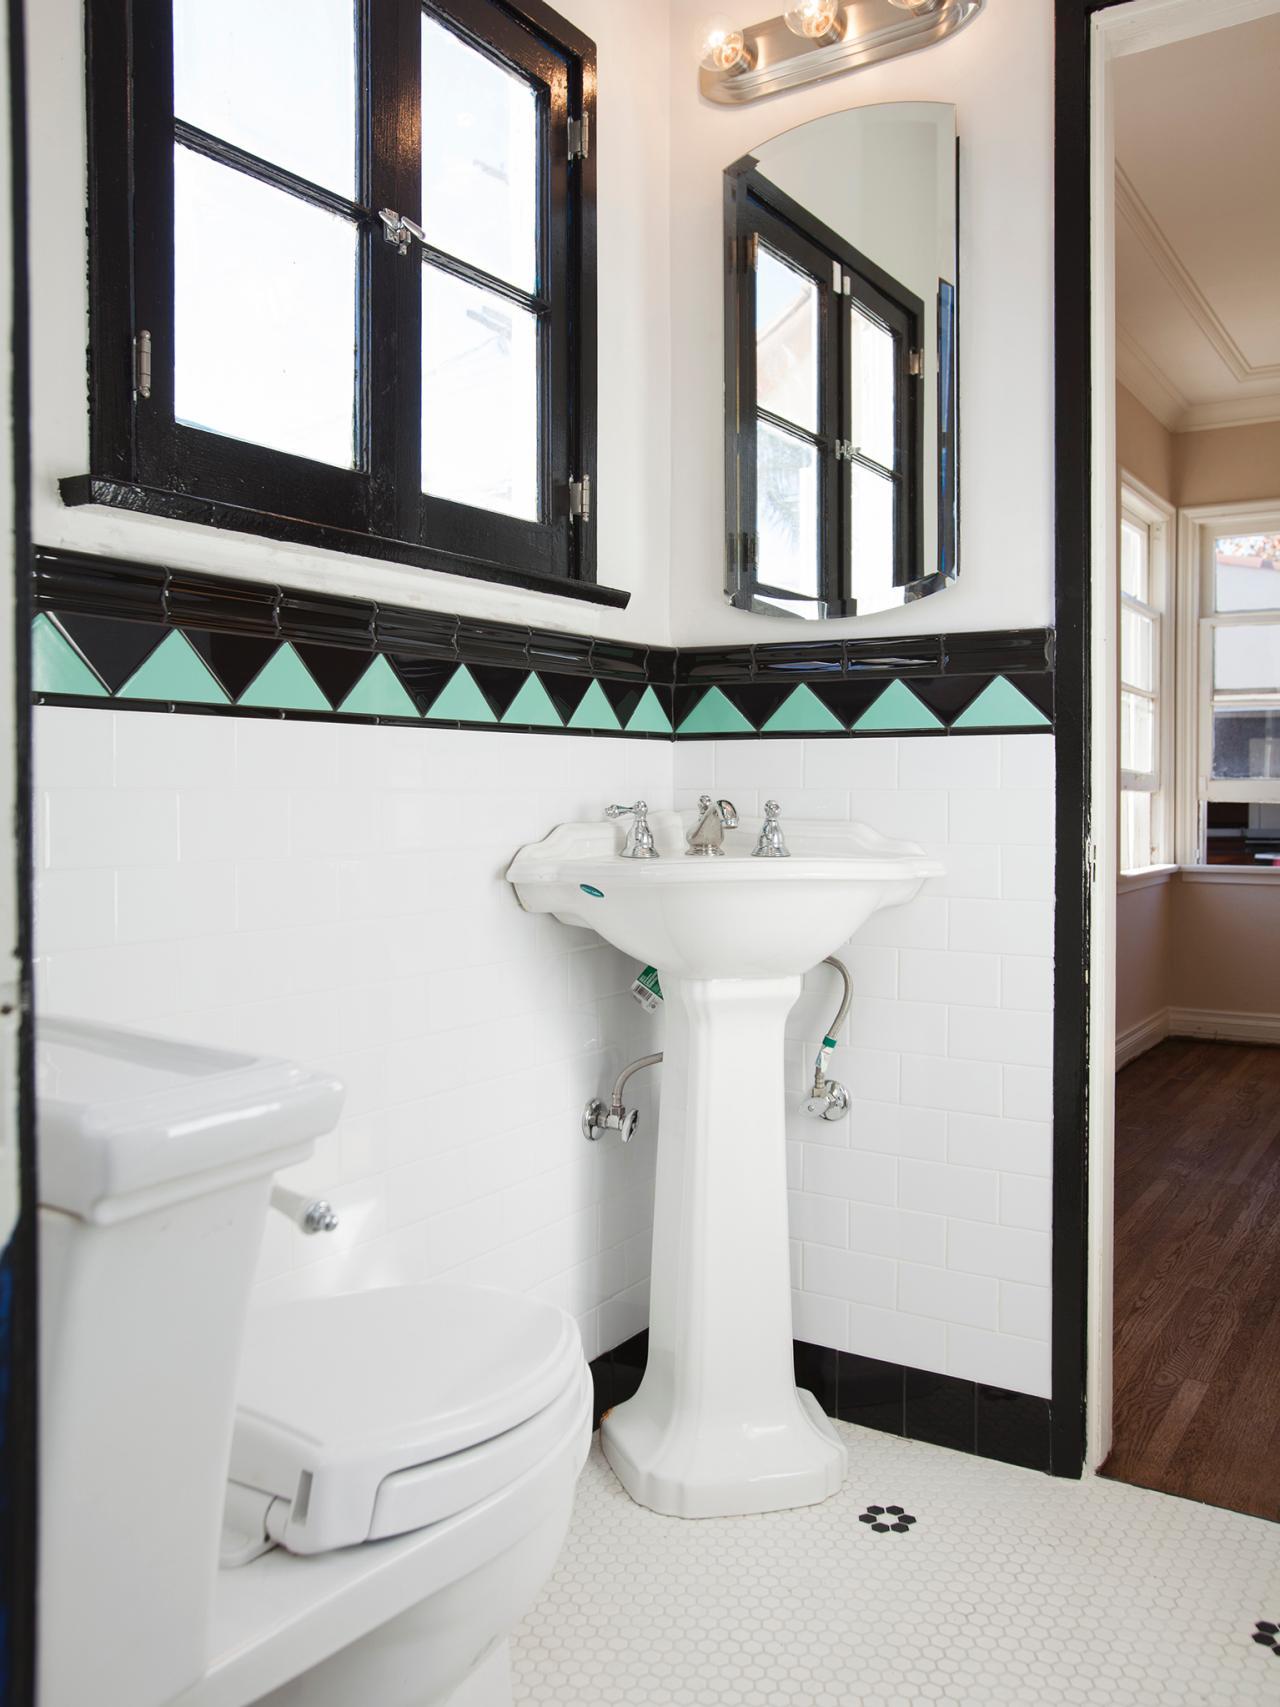 BP_HHURT306_art-deco-bathroom-after_v.jpg.rend.hgtvcom.1280.1707